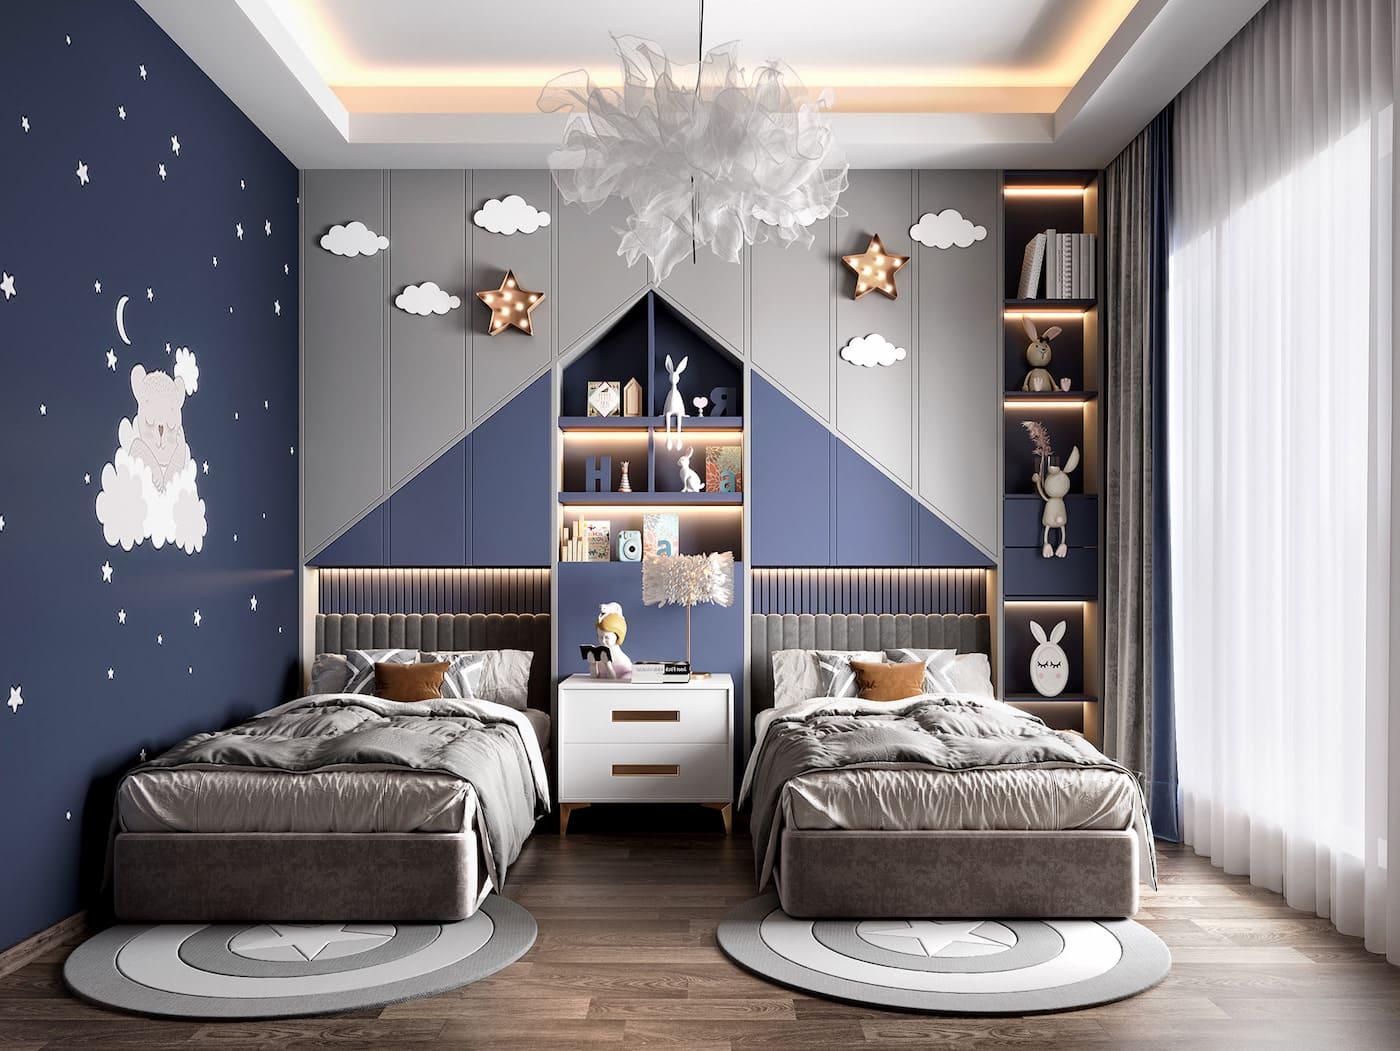 интерьер детской комнаты фото 15